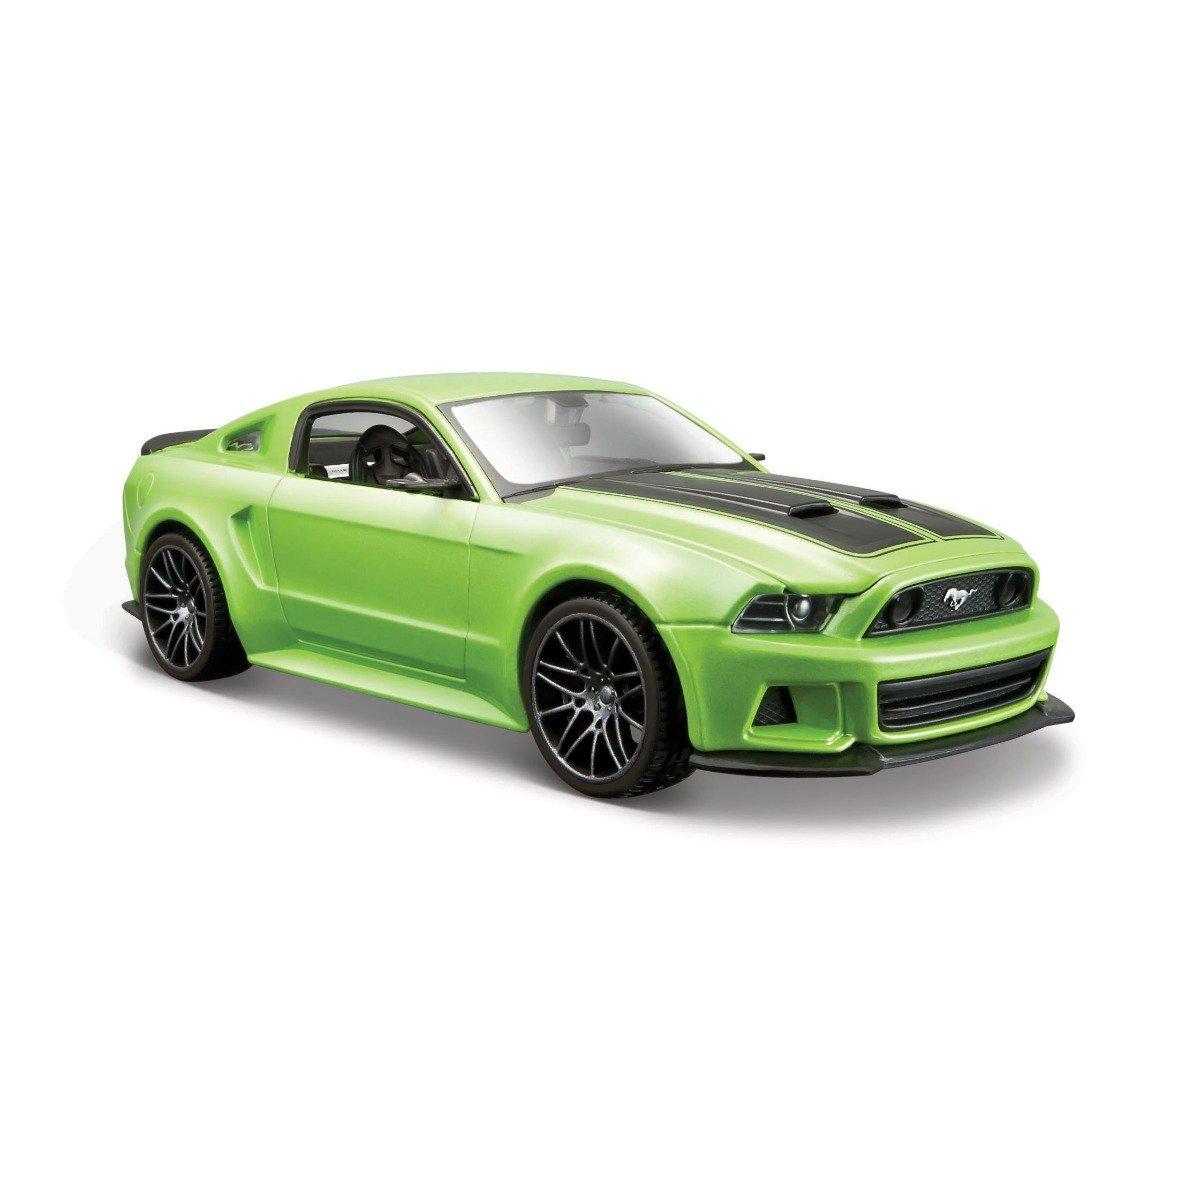 Masinuta Maisto Ford Mustang Street Racer 2014, 1:24, Verde